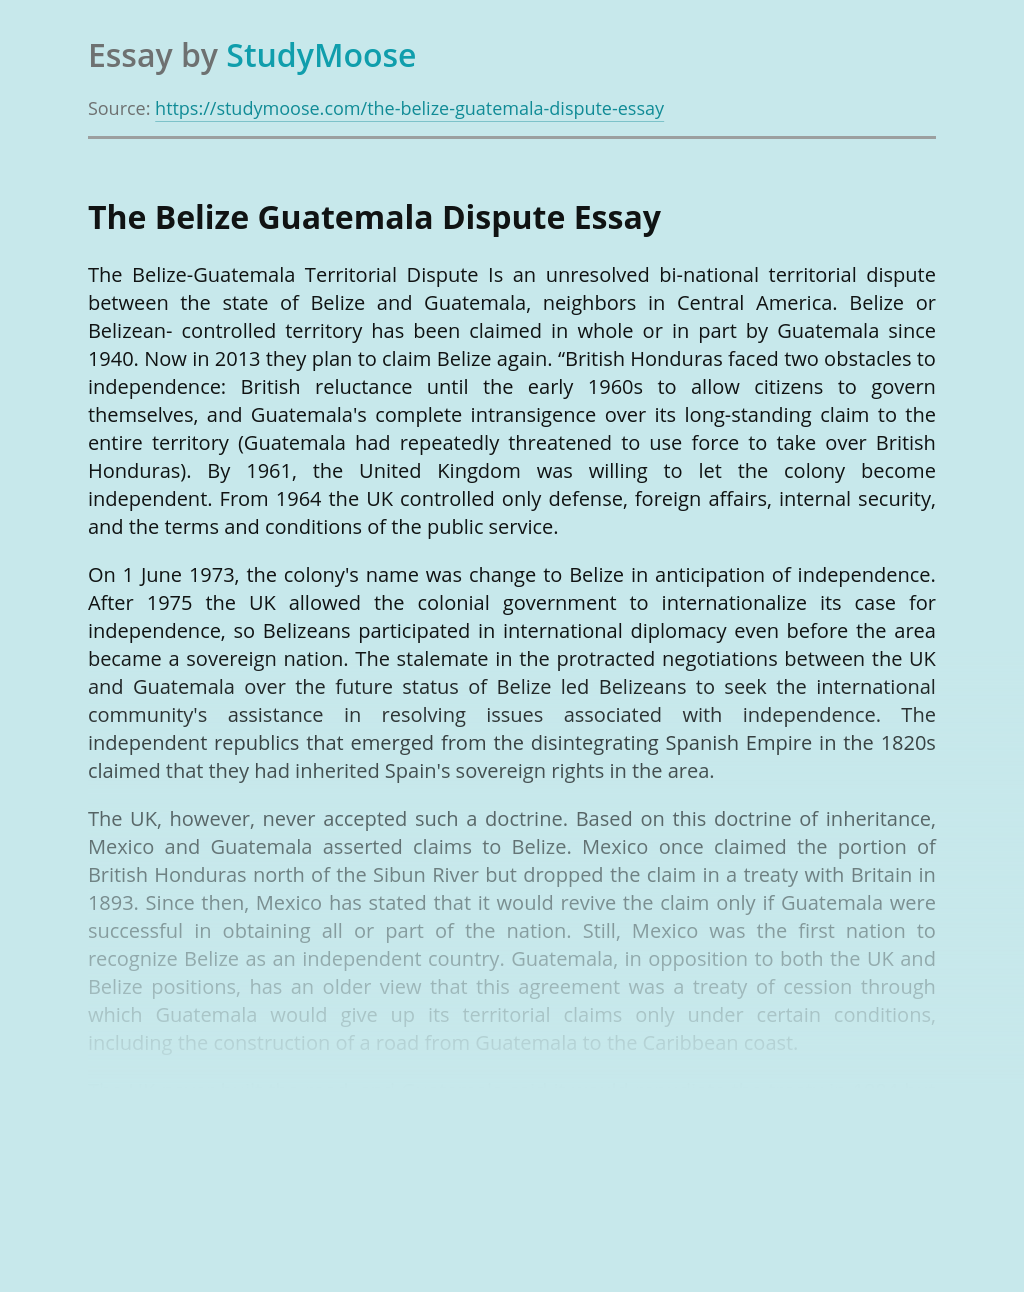 The Belize Guatemala Dispute